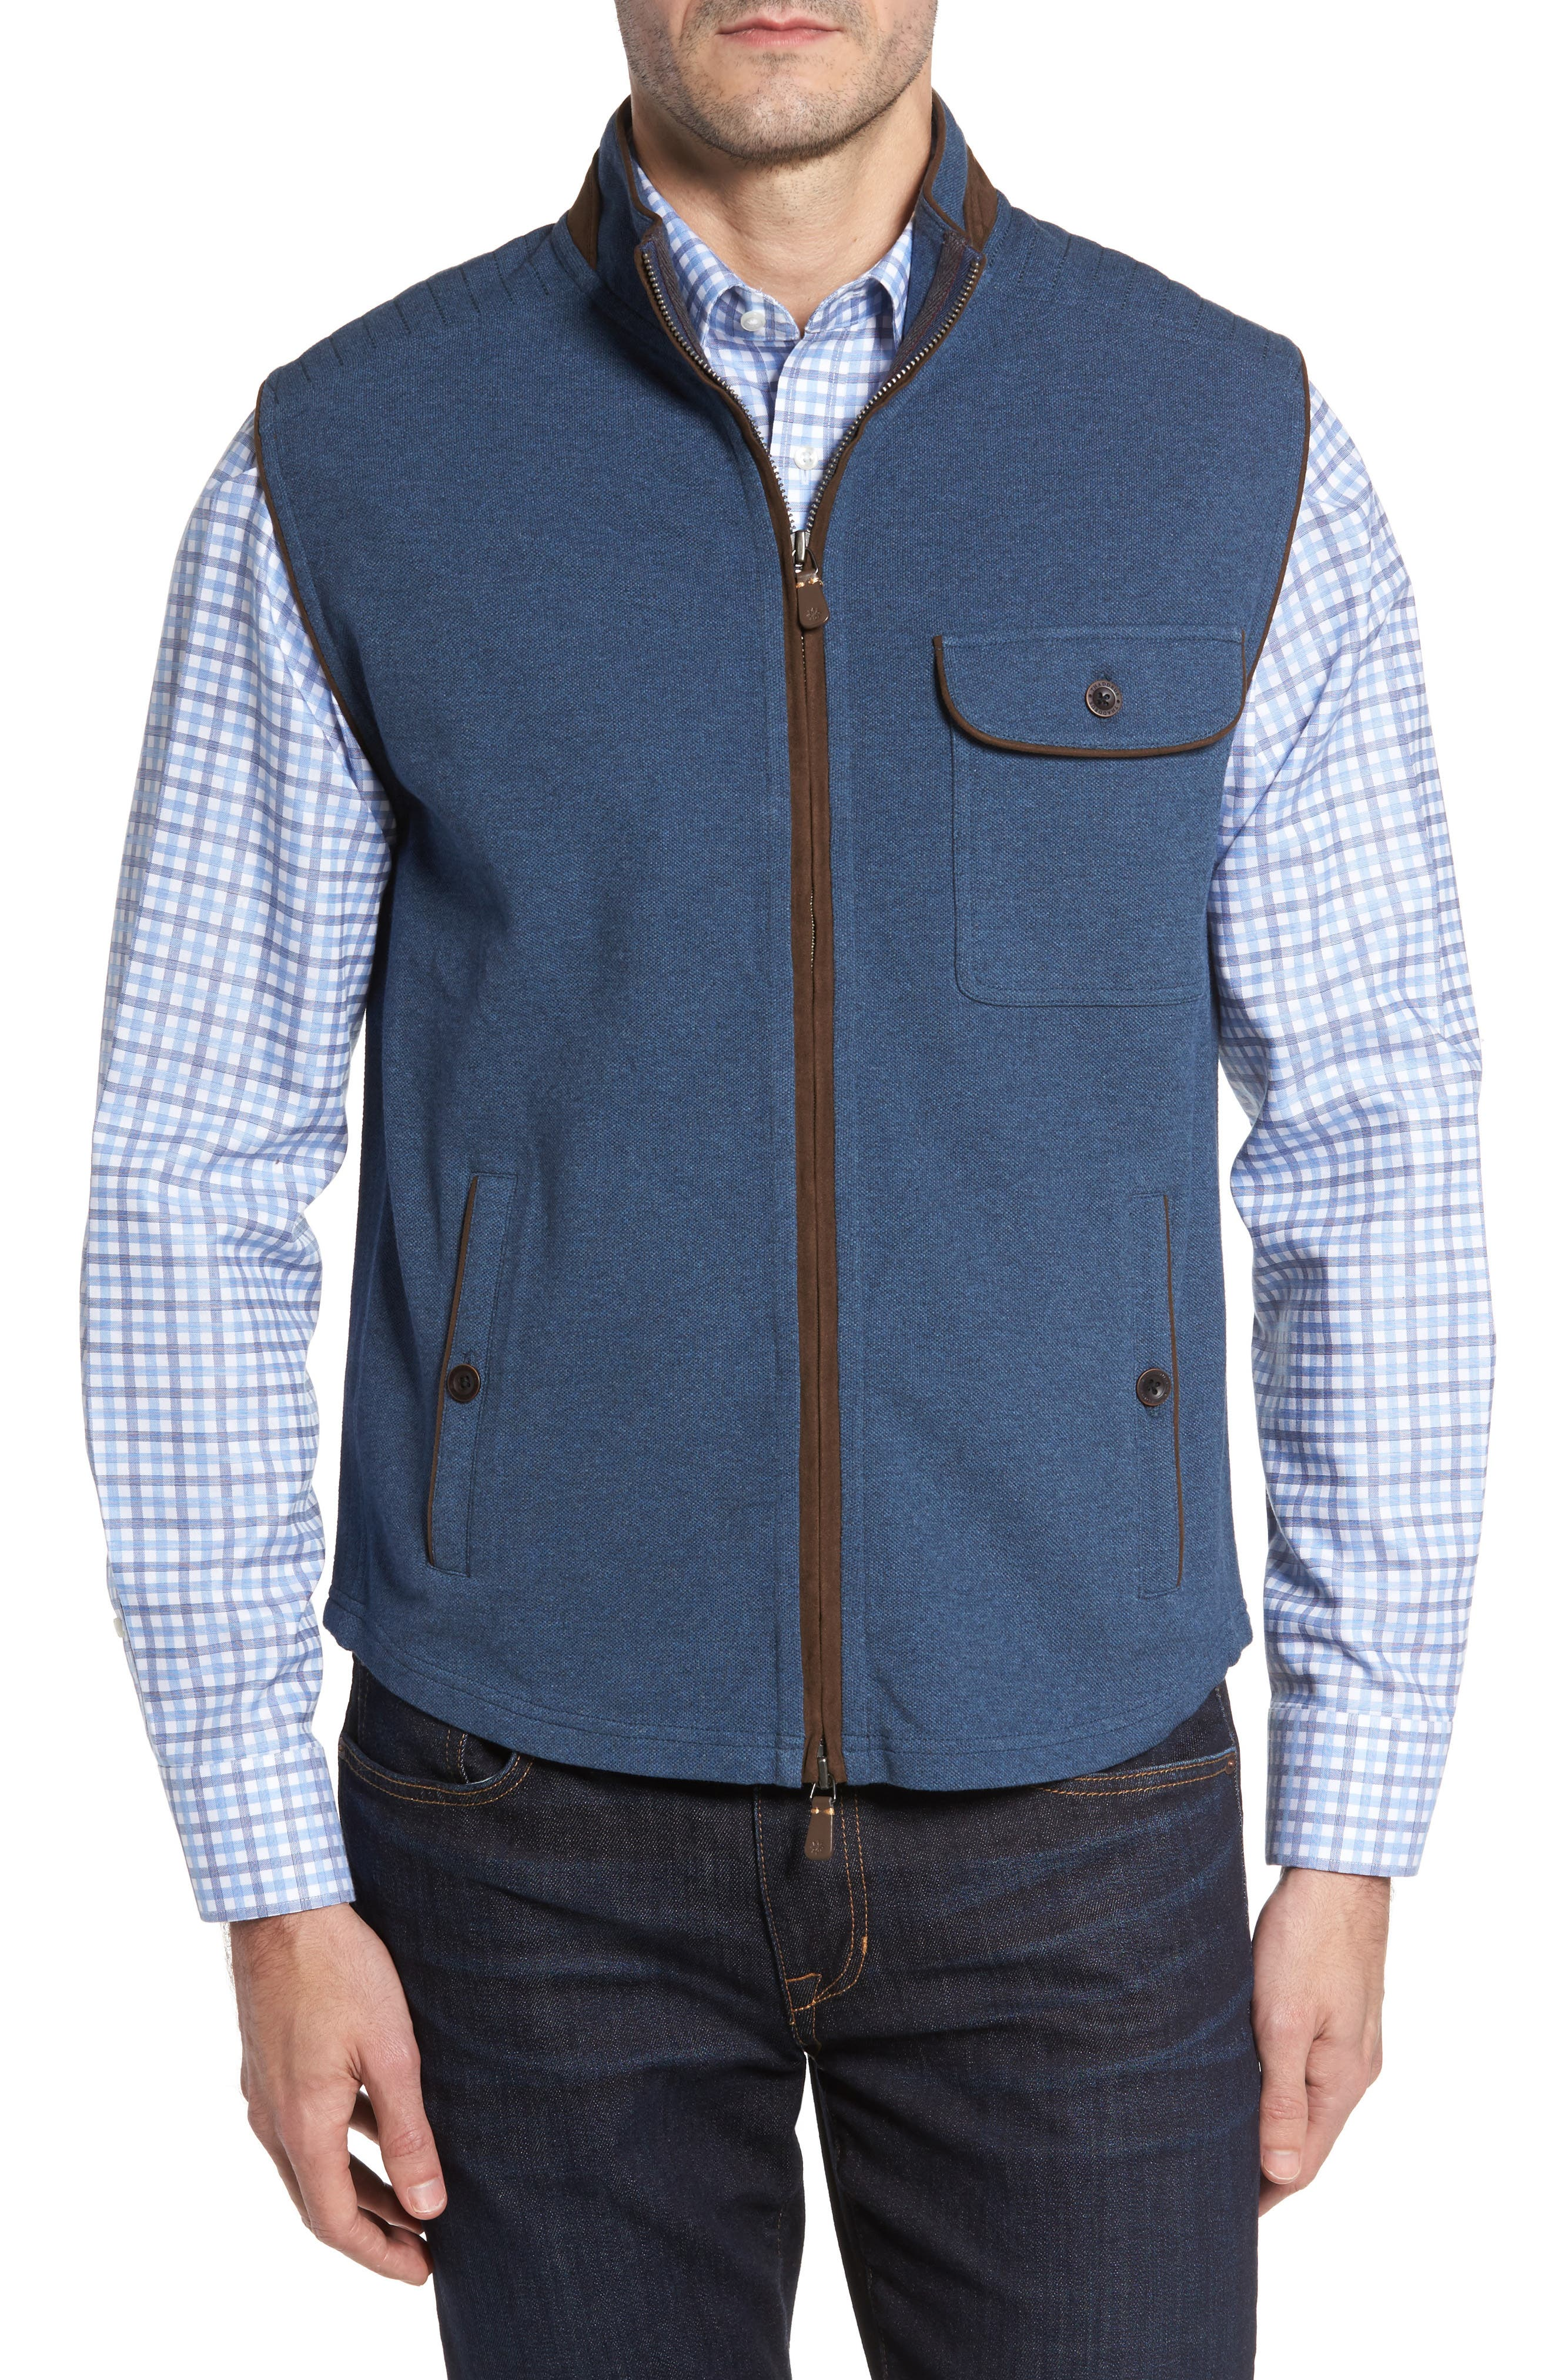 Main Image - Thaddeus Robert Full Zip Vest